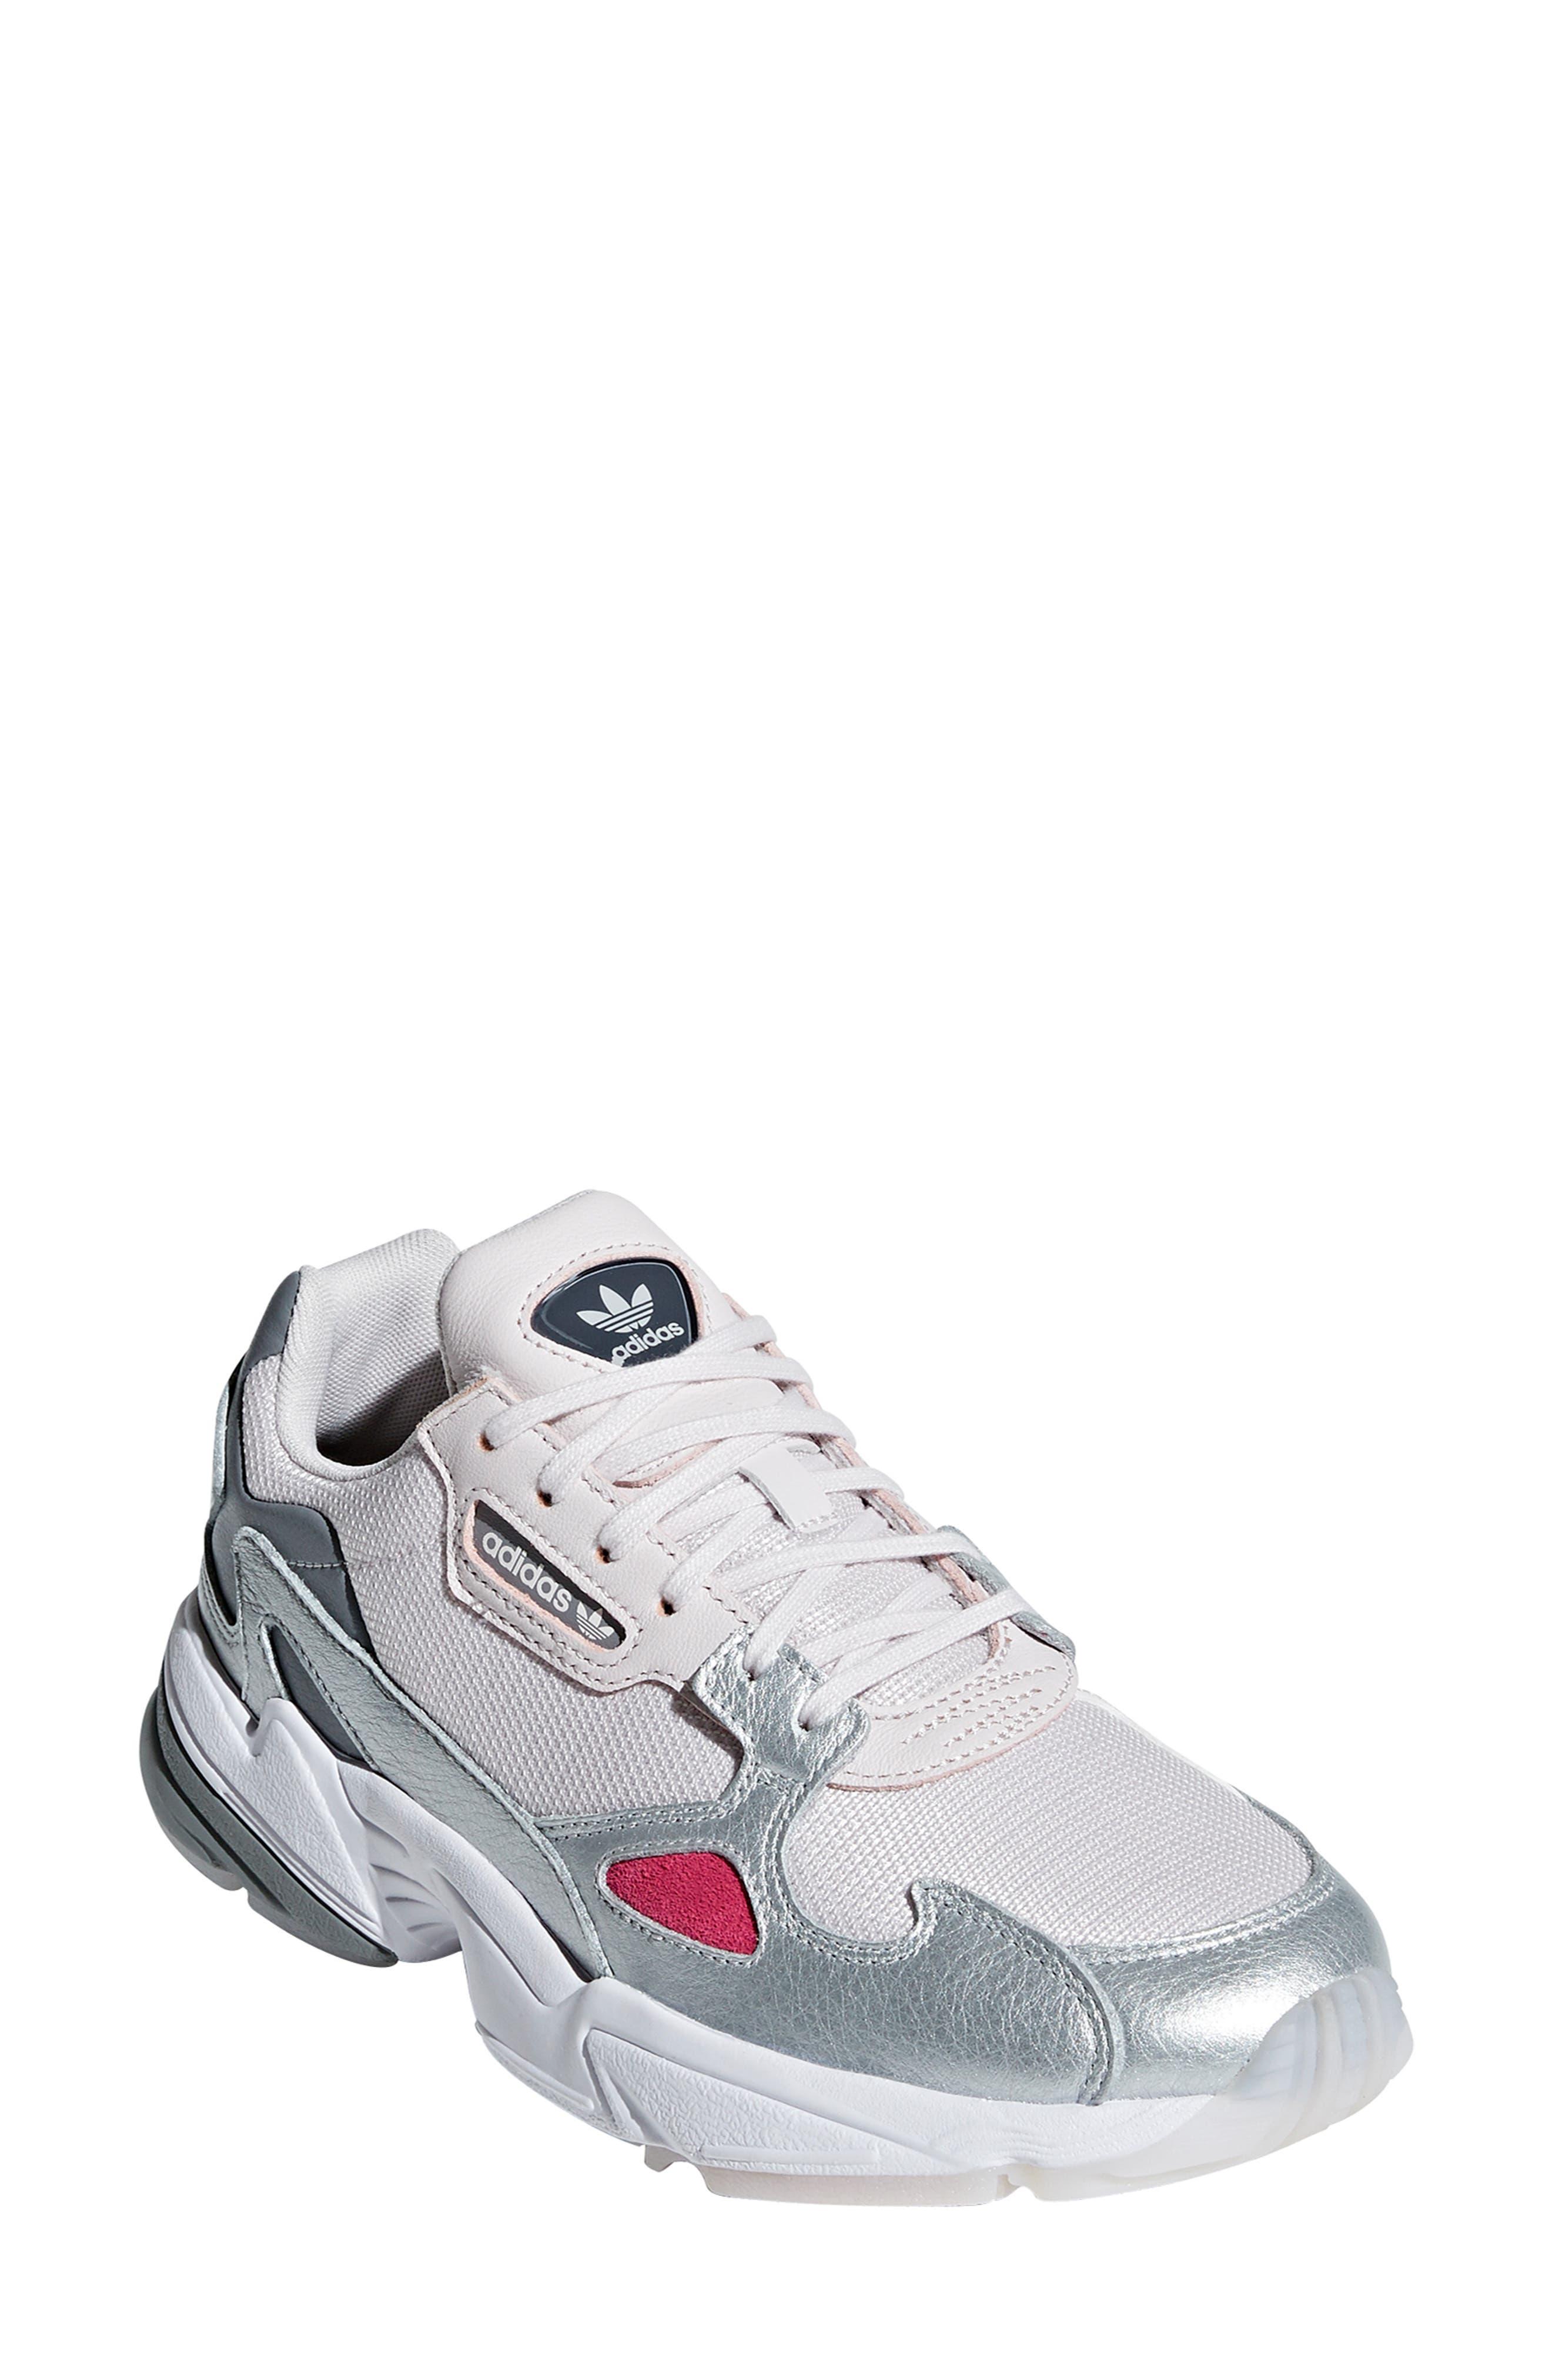 Falcon Sneaker,                         Main,                         color, ORCHID TINT/ SILVER